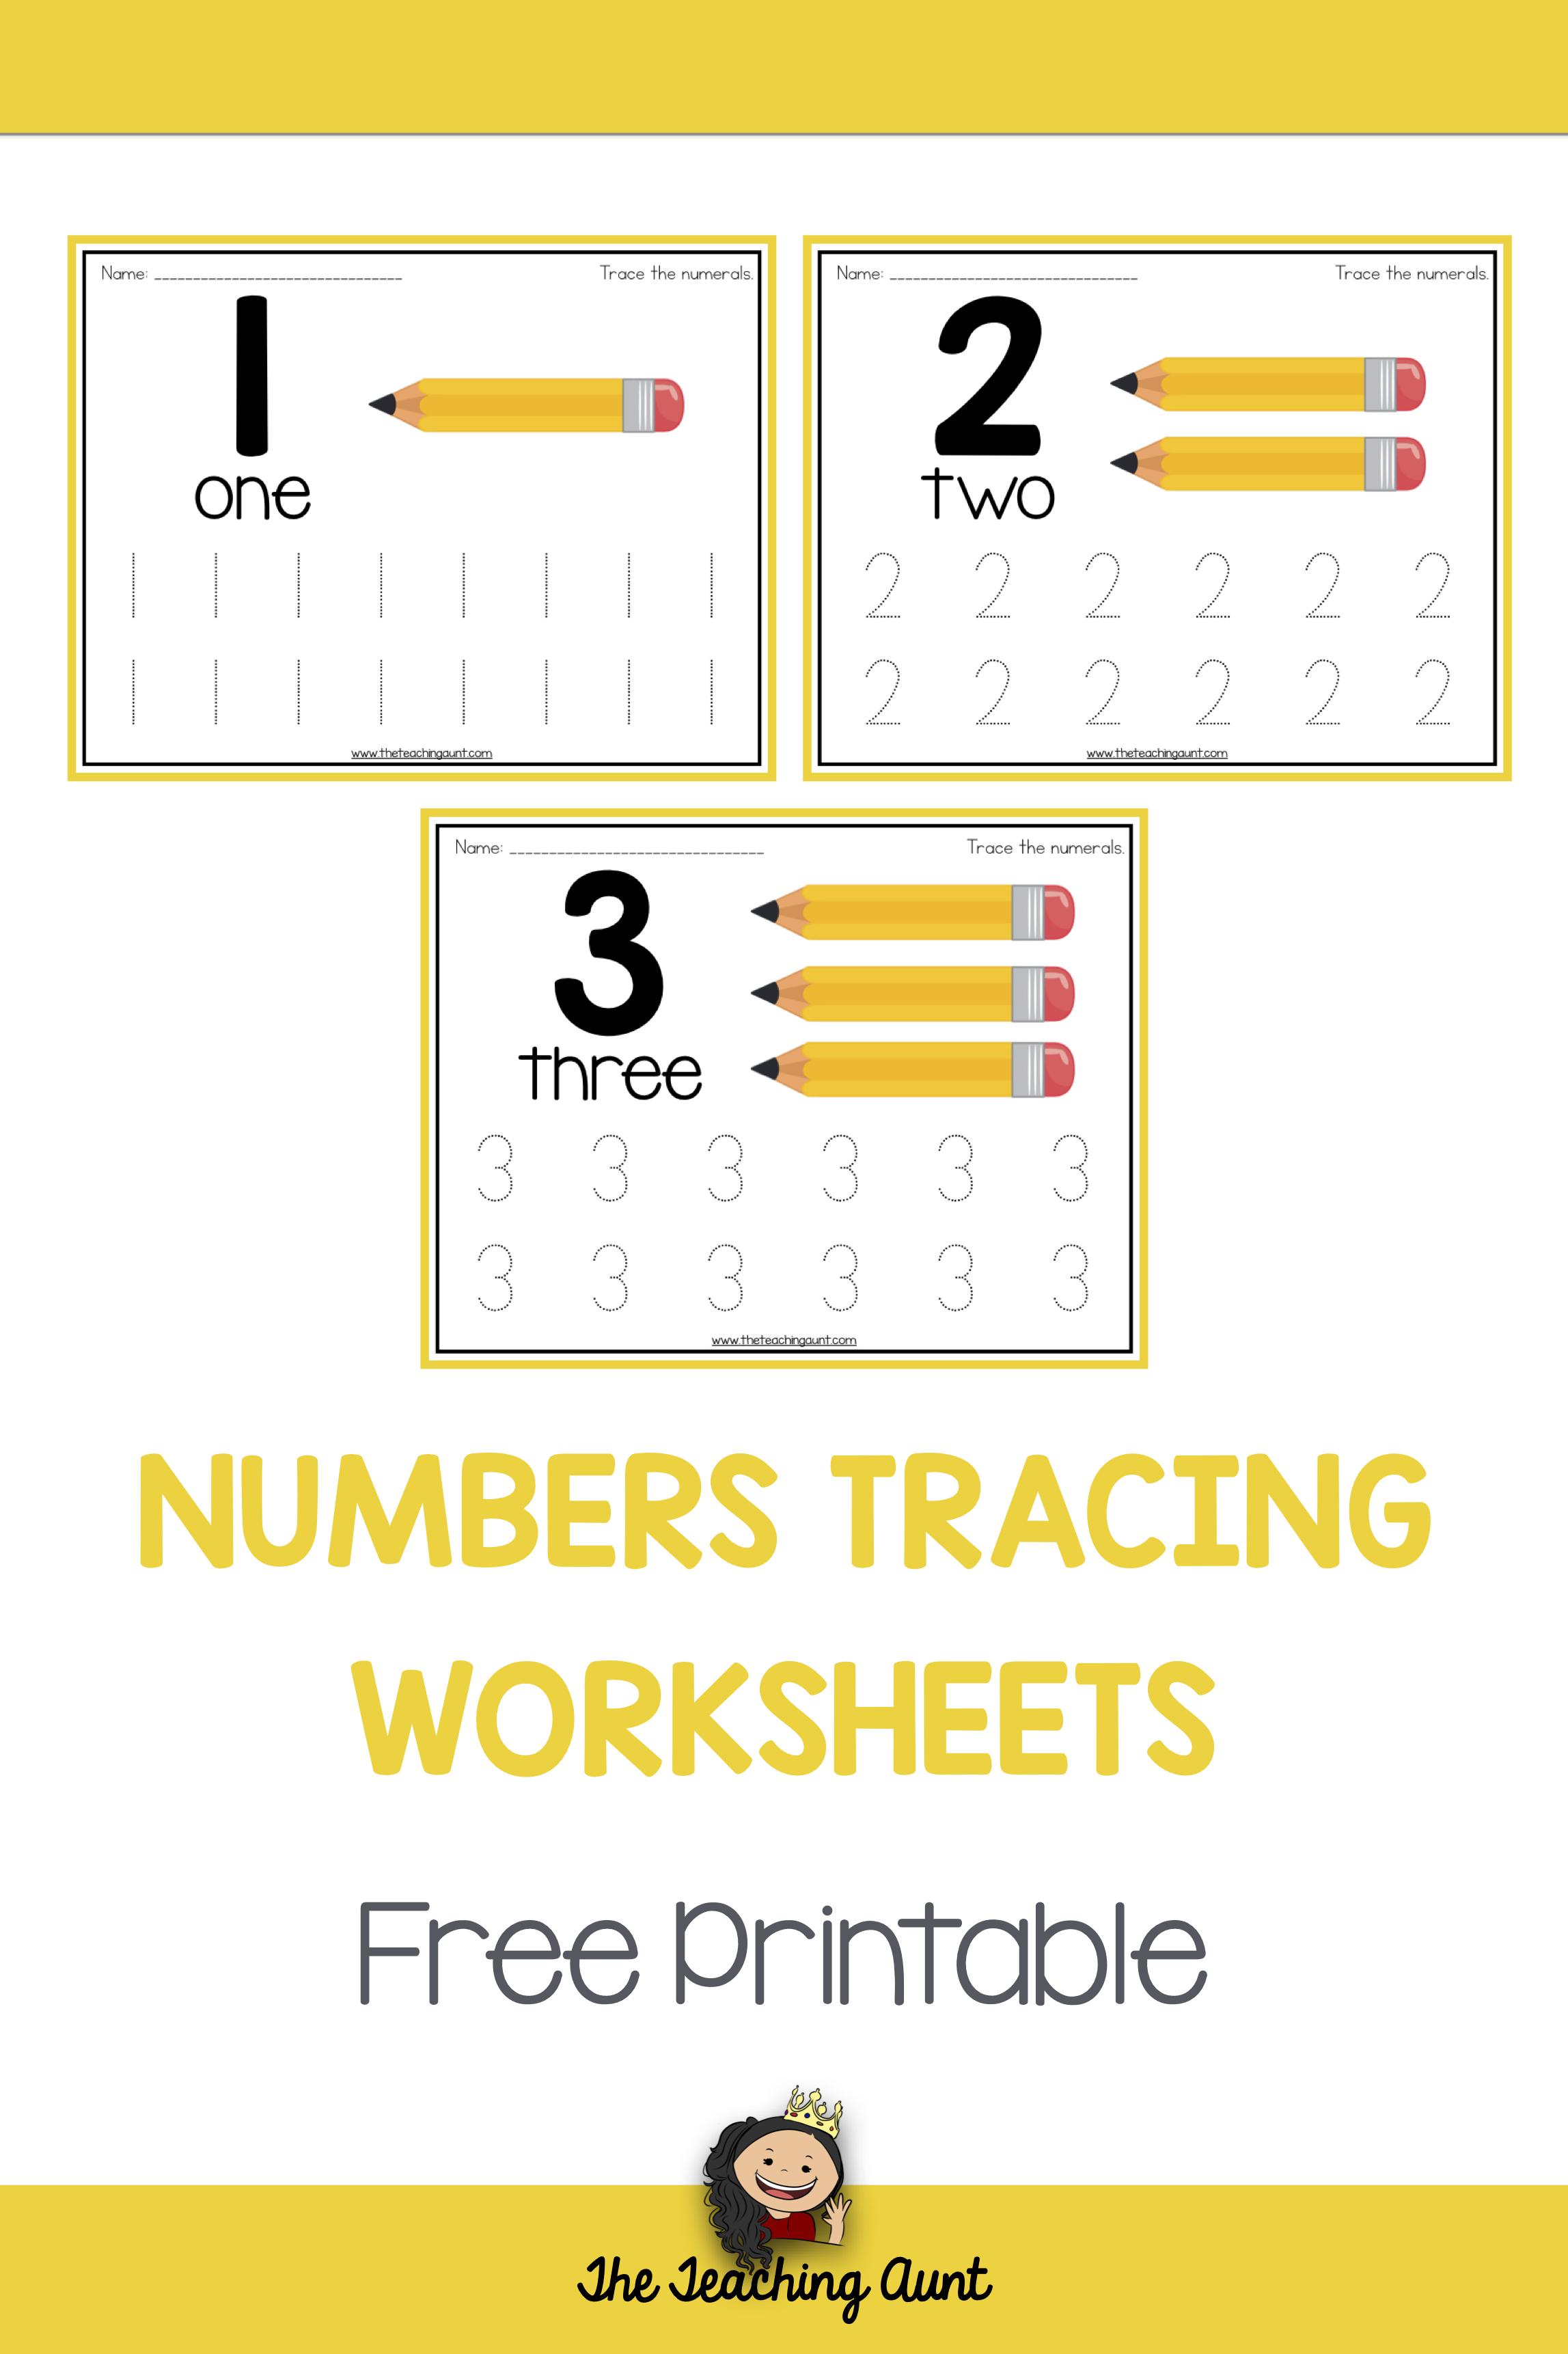 Number Tracing Worksheets For Children